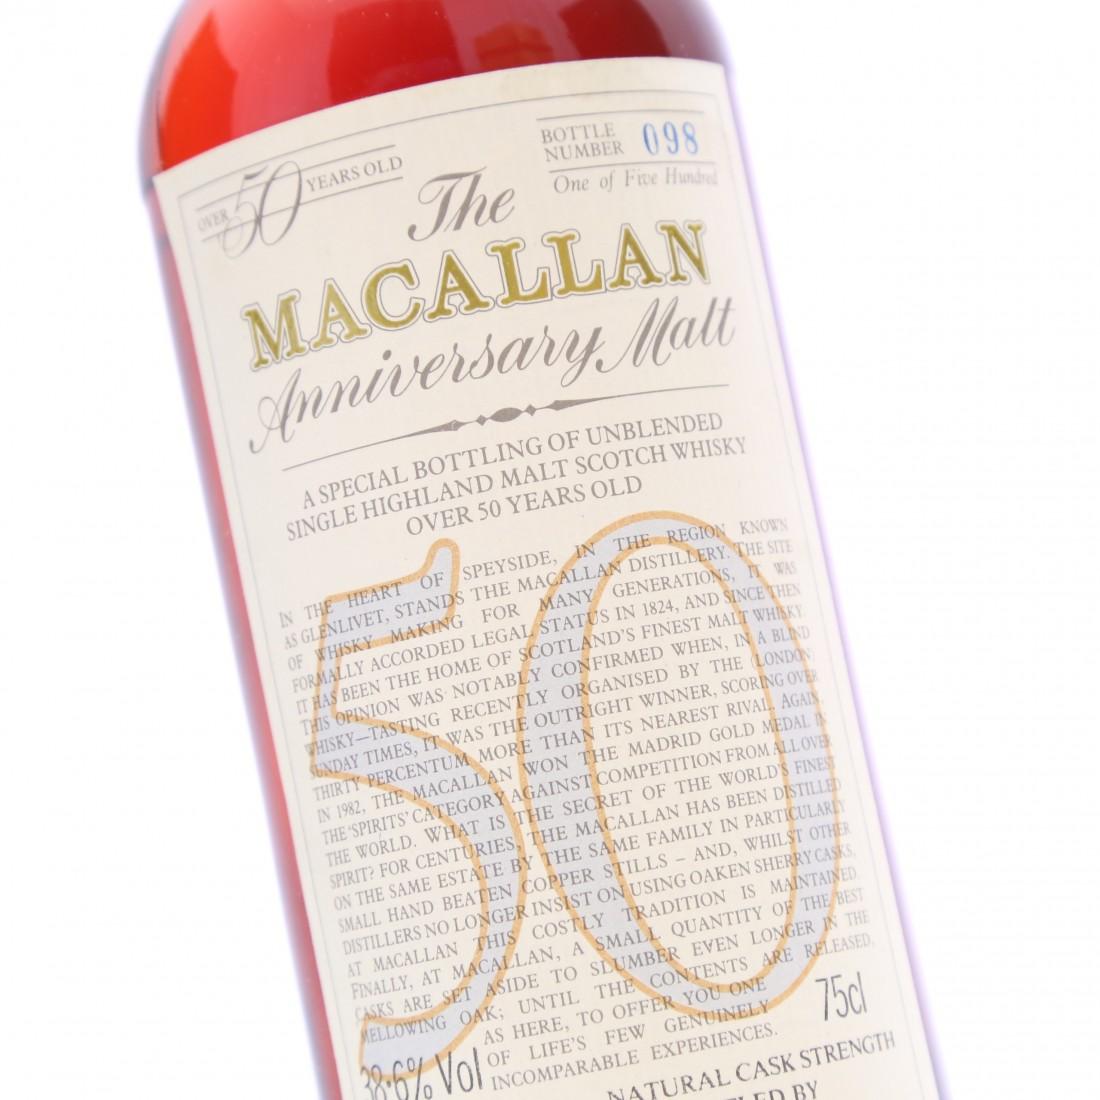 Macallan 1928 Anniversary Malt 50 Year Old